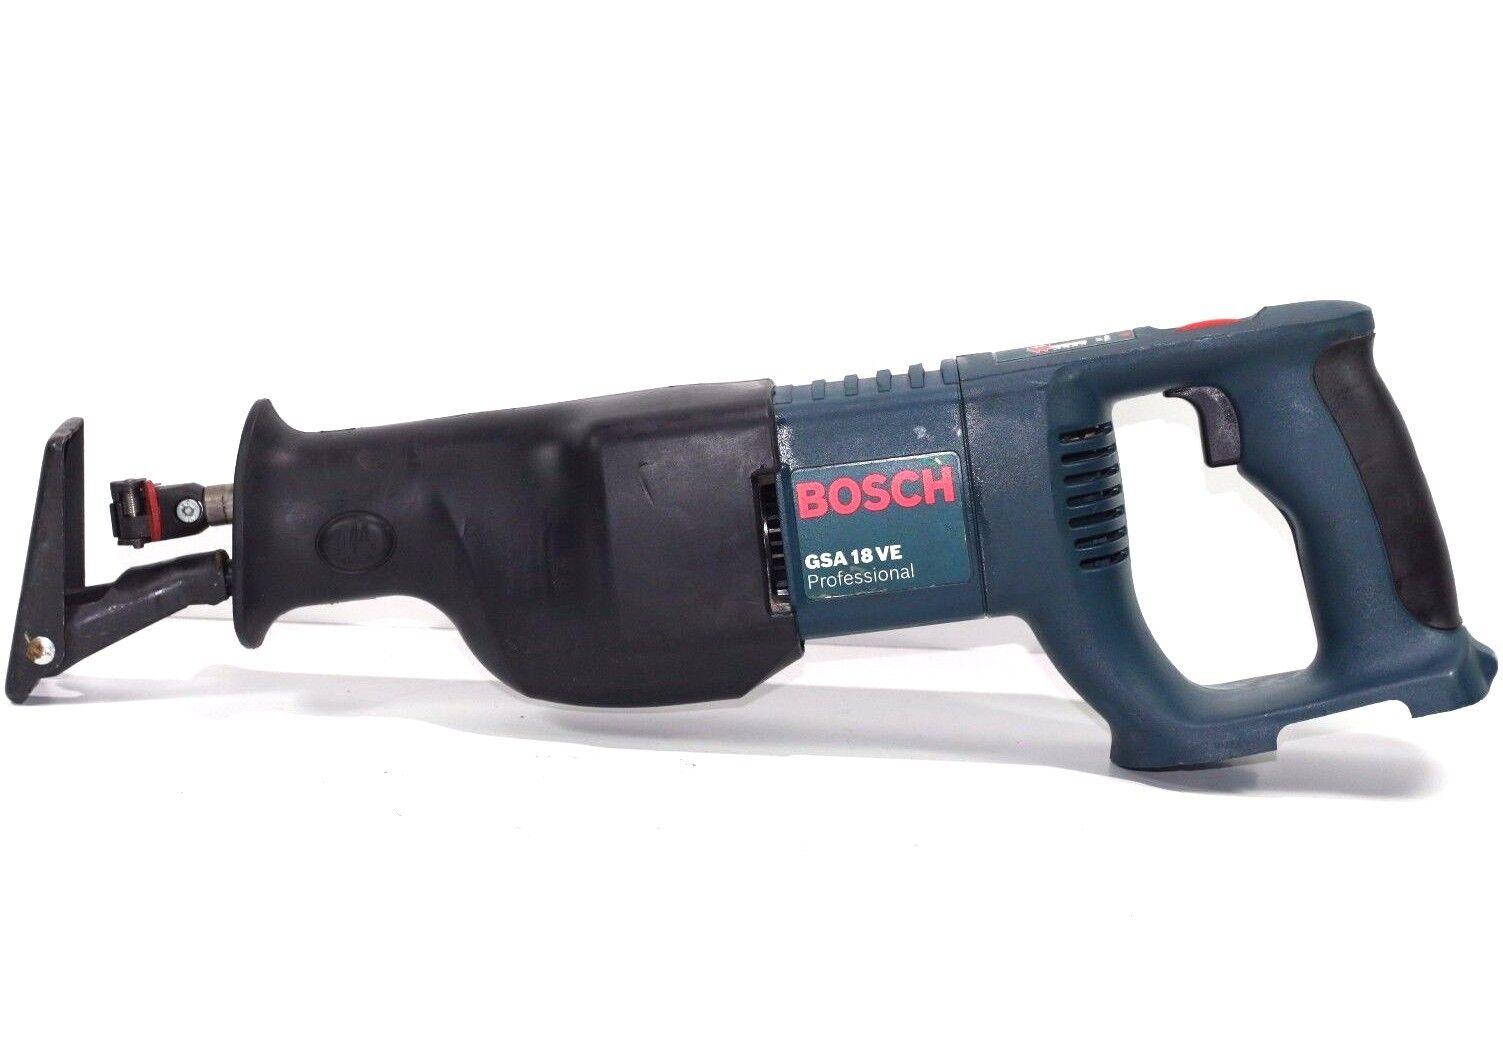 Bosch Akku Säbelsäge  Säbel Säge  GSA 18 VE Solo   NiCd